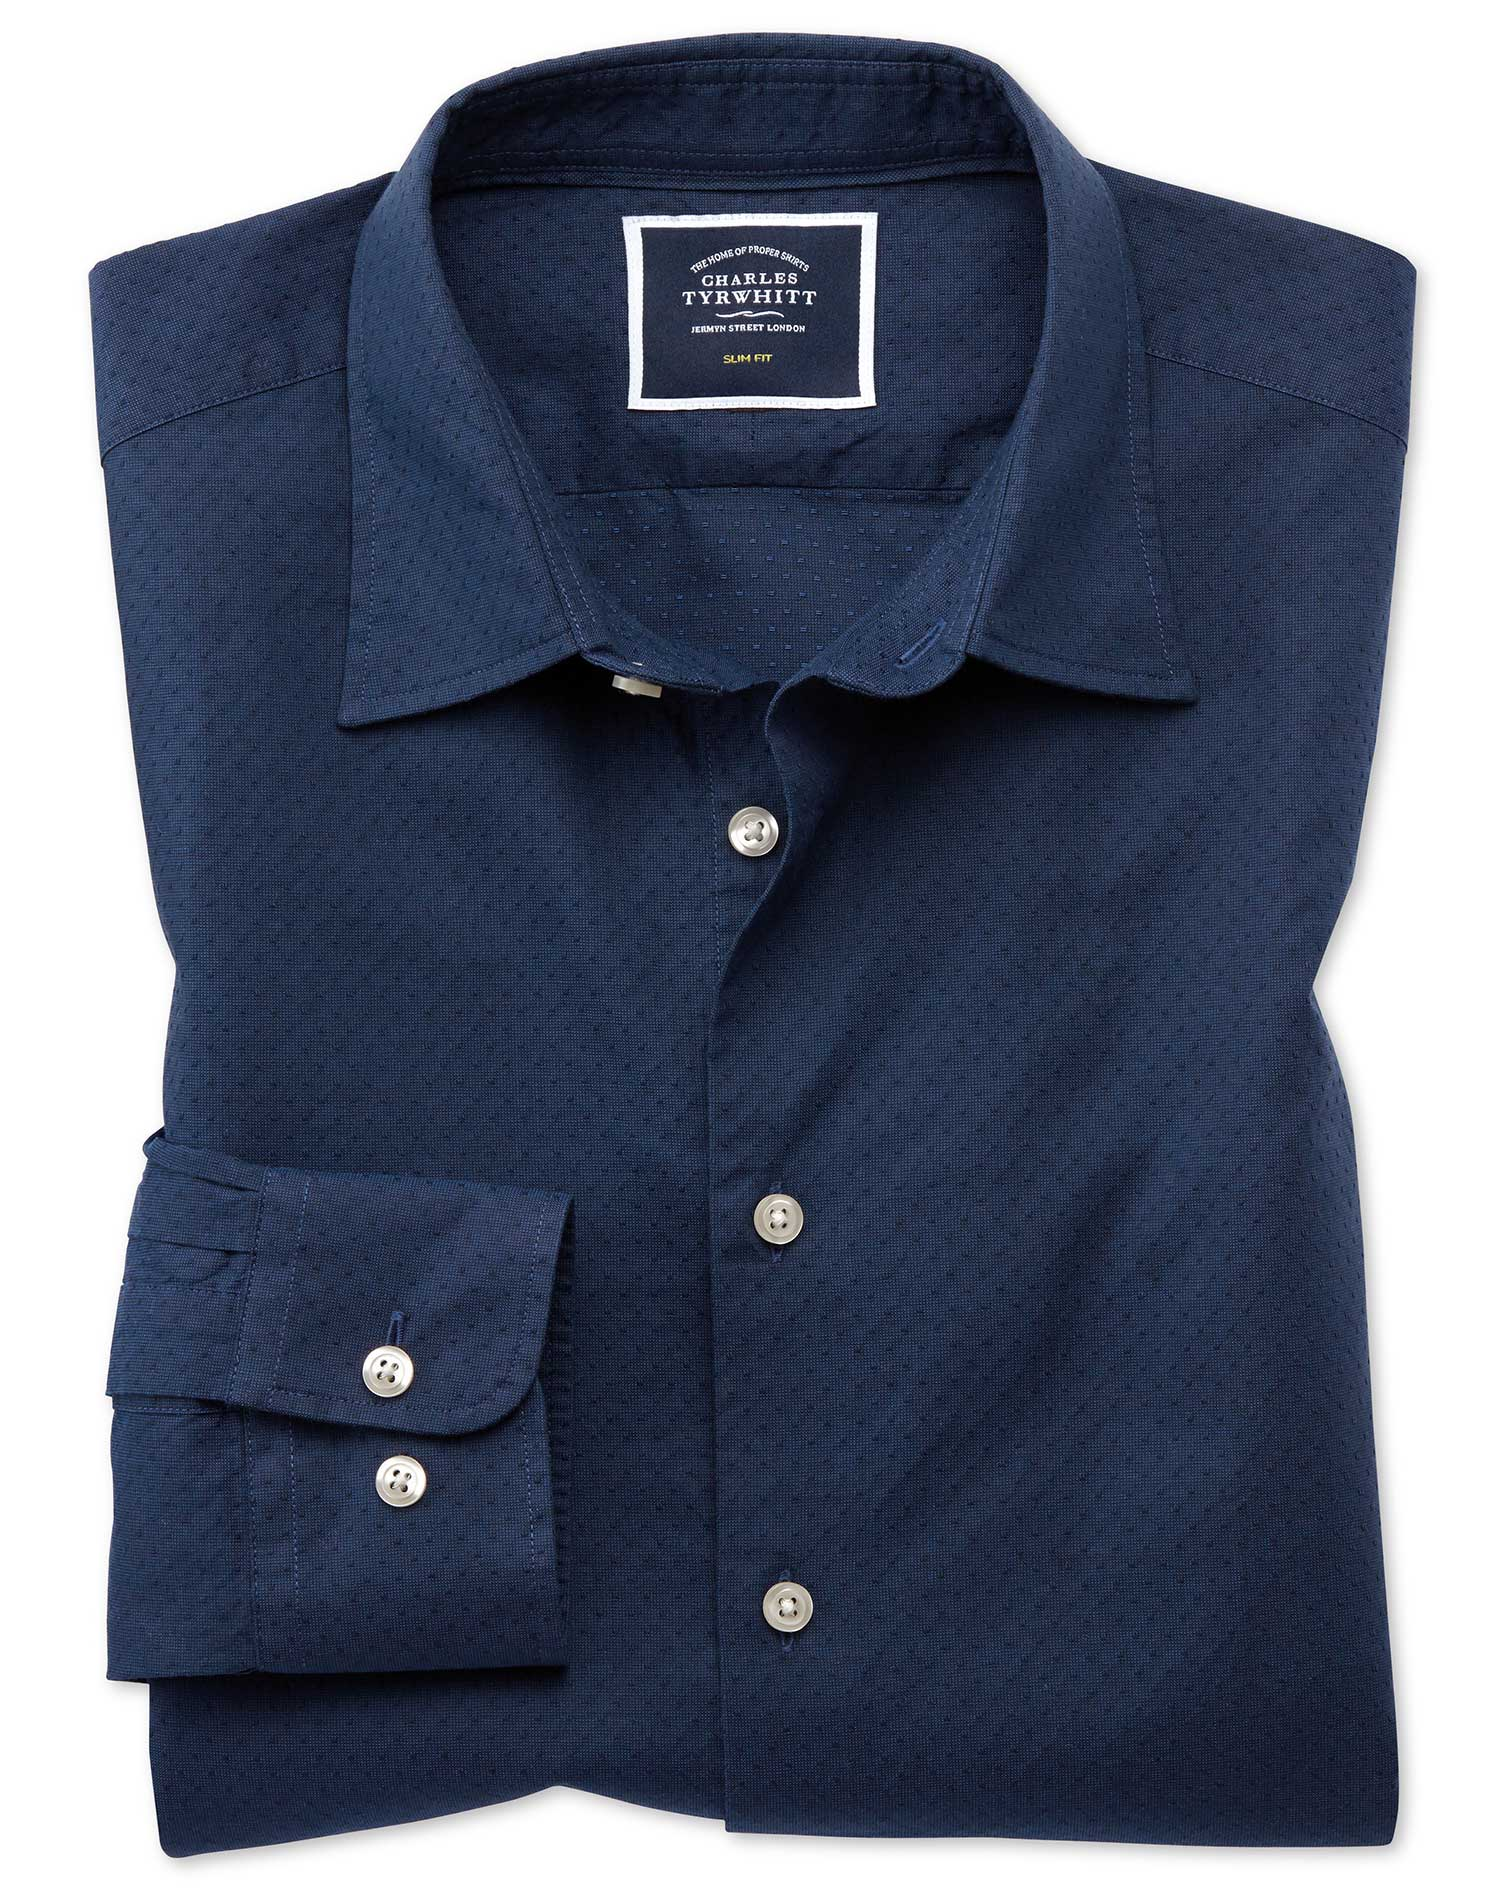 Classic Fit Dark Blue Spot Soft Texture Cotton Shirt Single Cuff Size XXXL by Charles Tyrwhitt